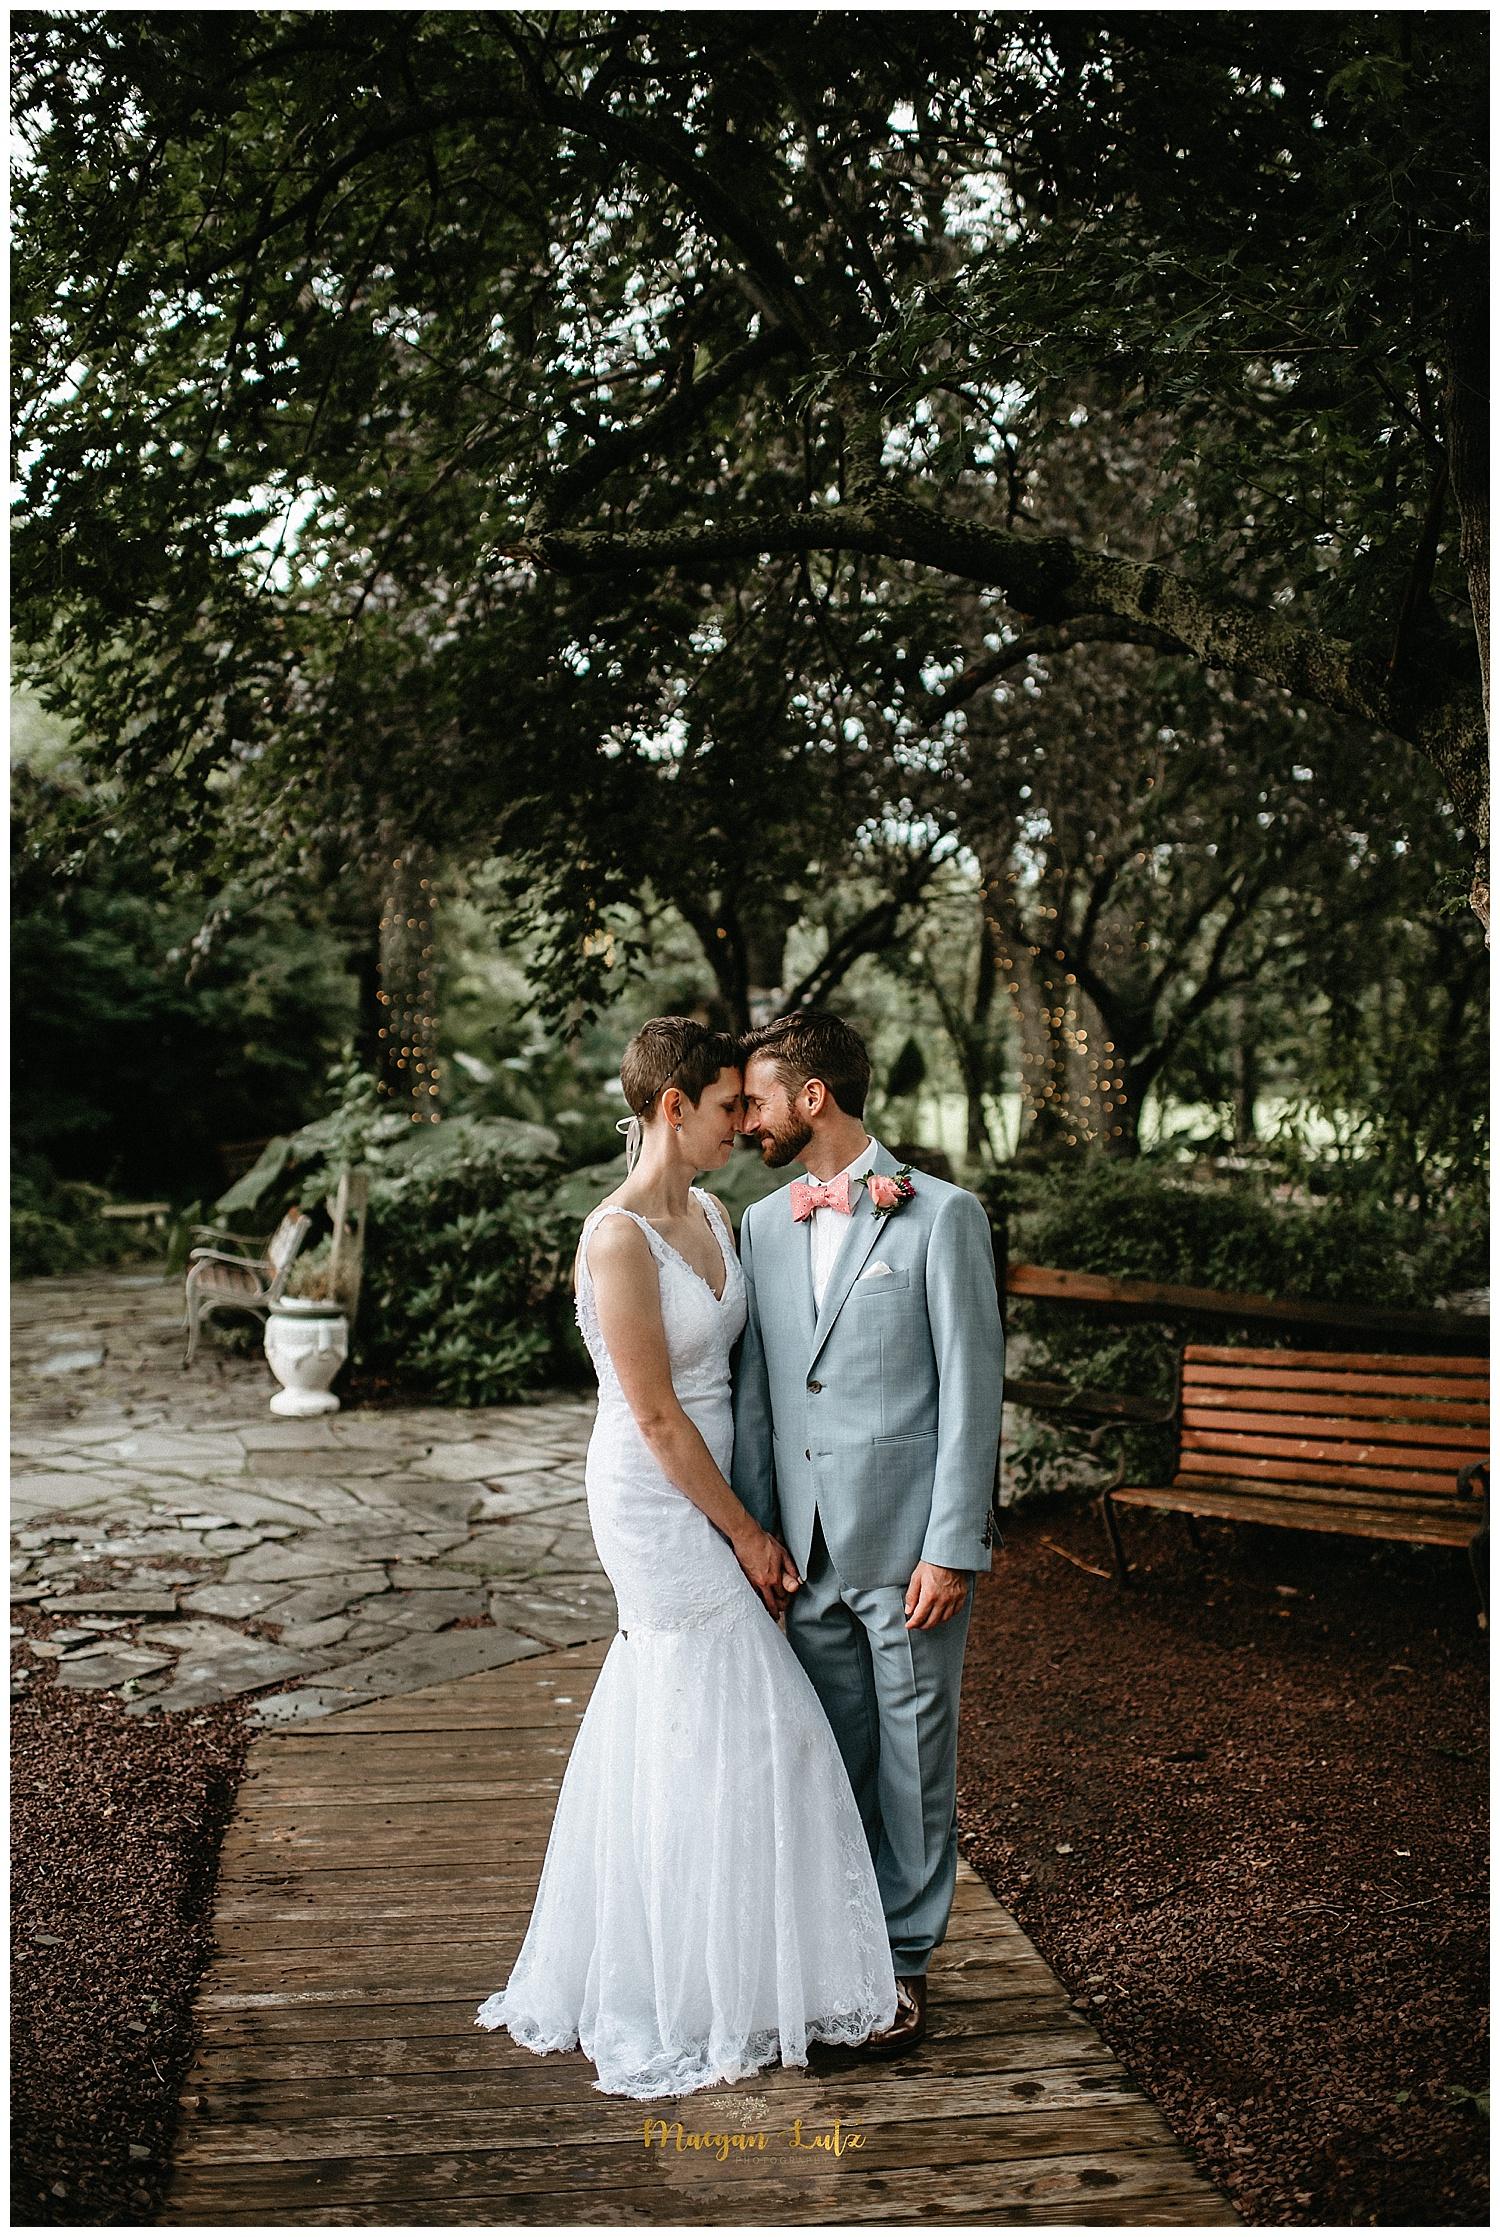 NEPA-Wedding-Photographer-at-Carmens-Country-Inn-and-Gardens-Drums-PA_0009.jpg